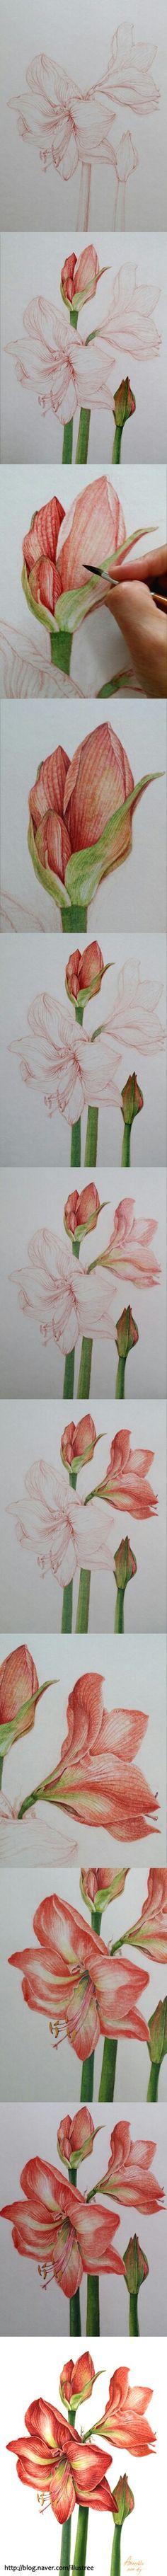 "Botanicalart ""Amaryllis"" watercolor working Illustration by EJ"